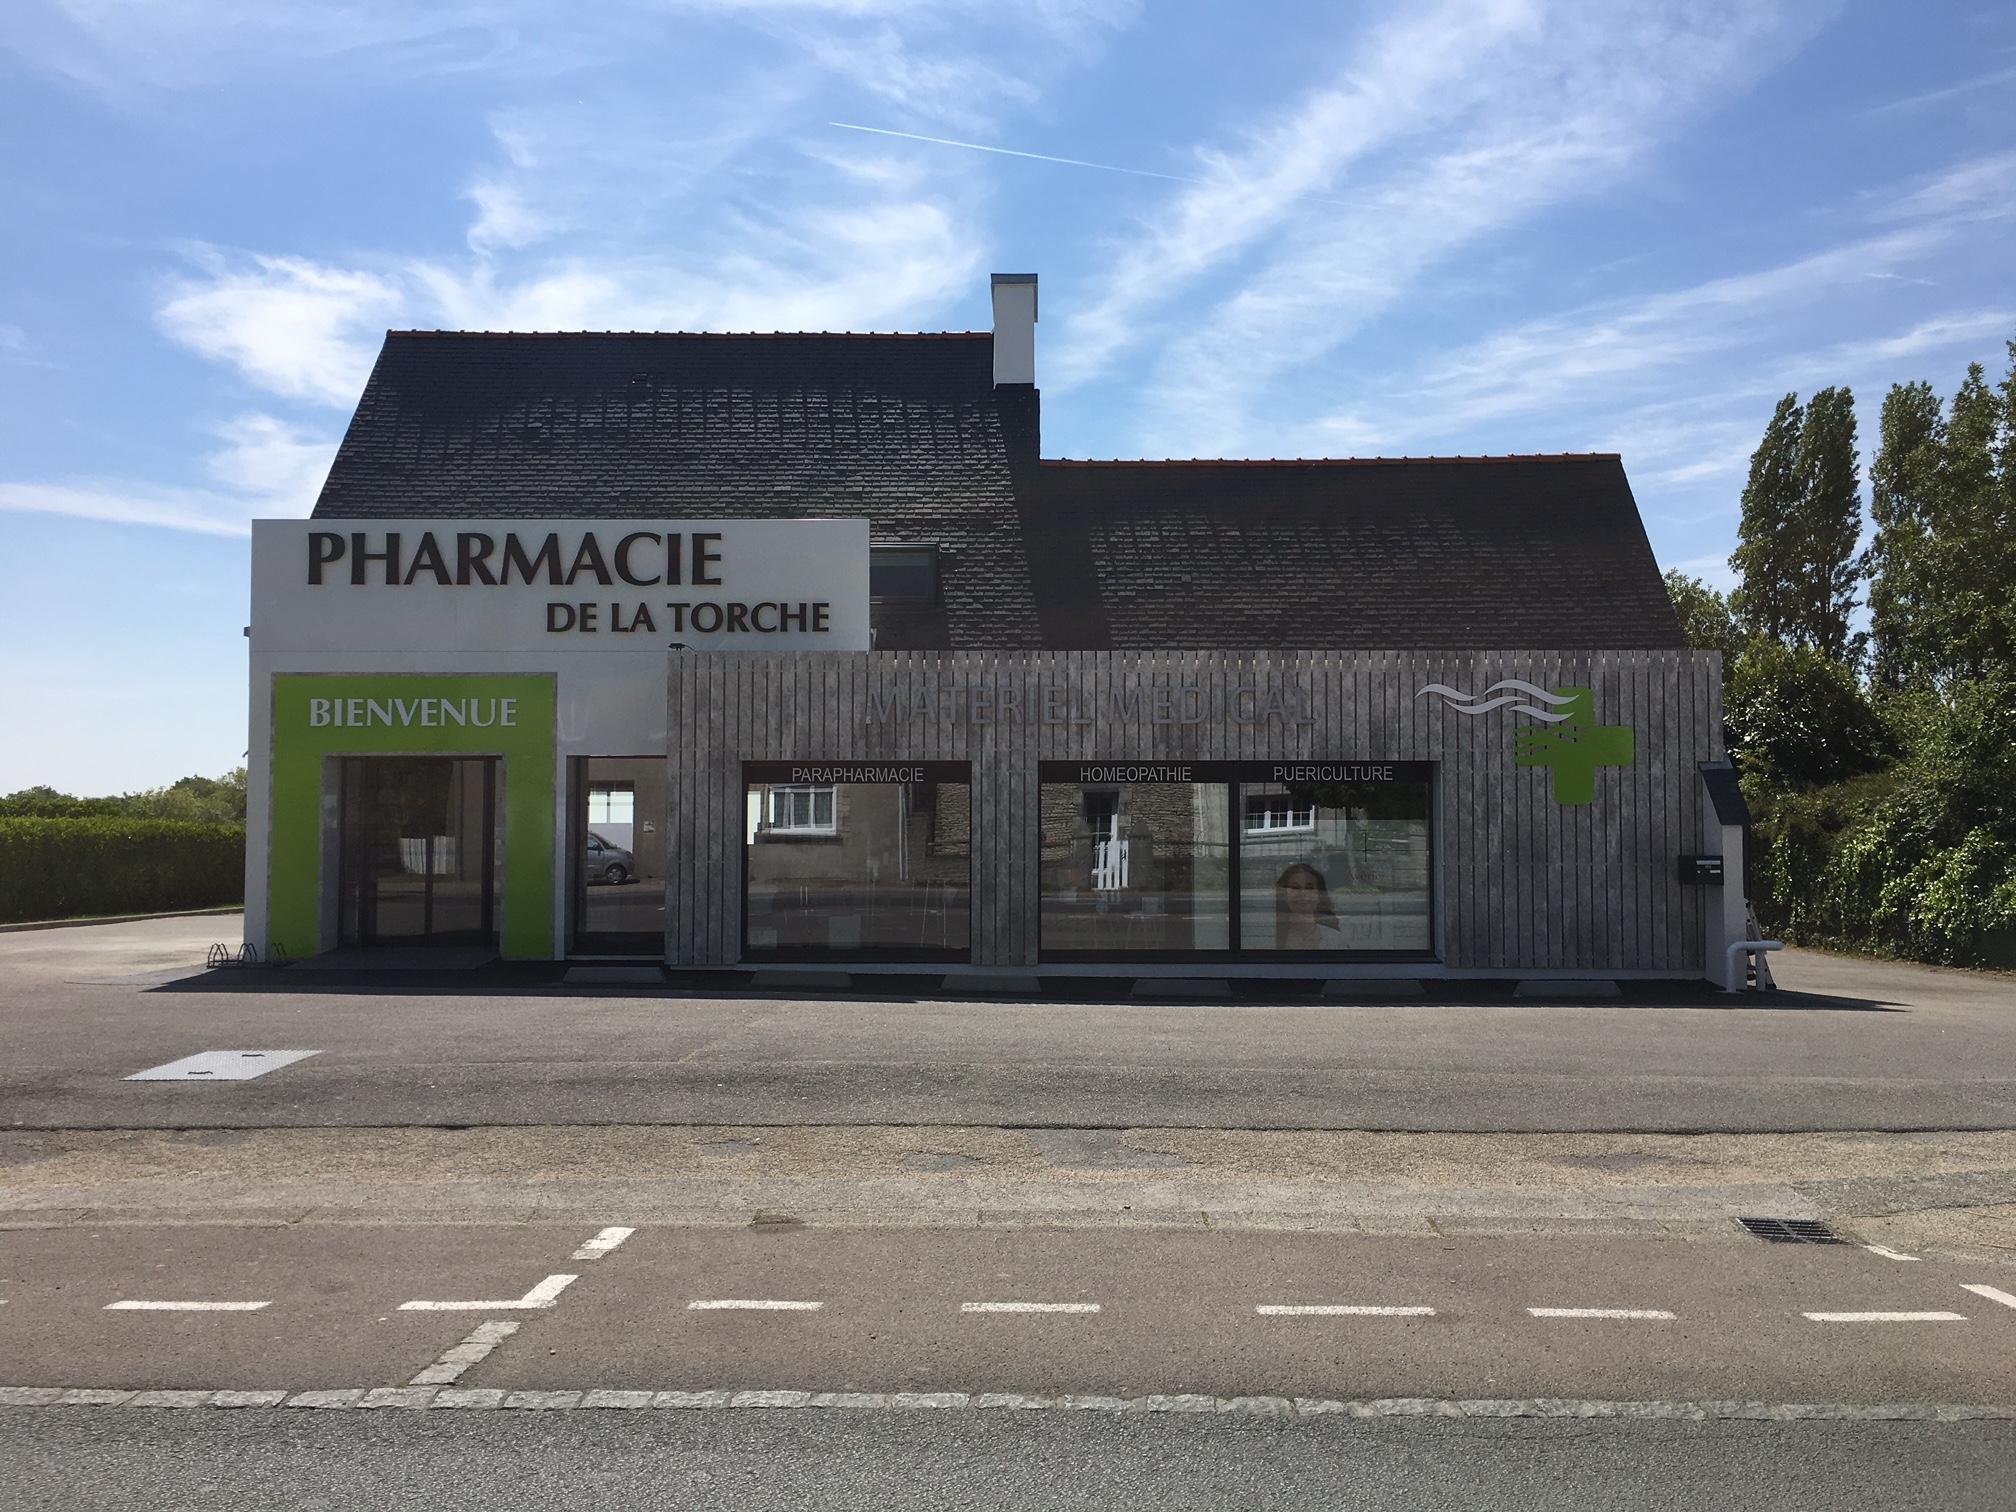 Pharmacie de la torche